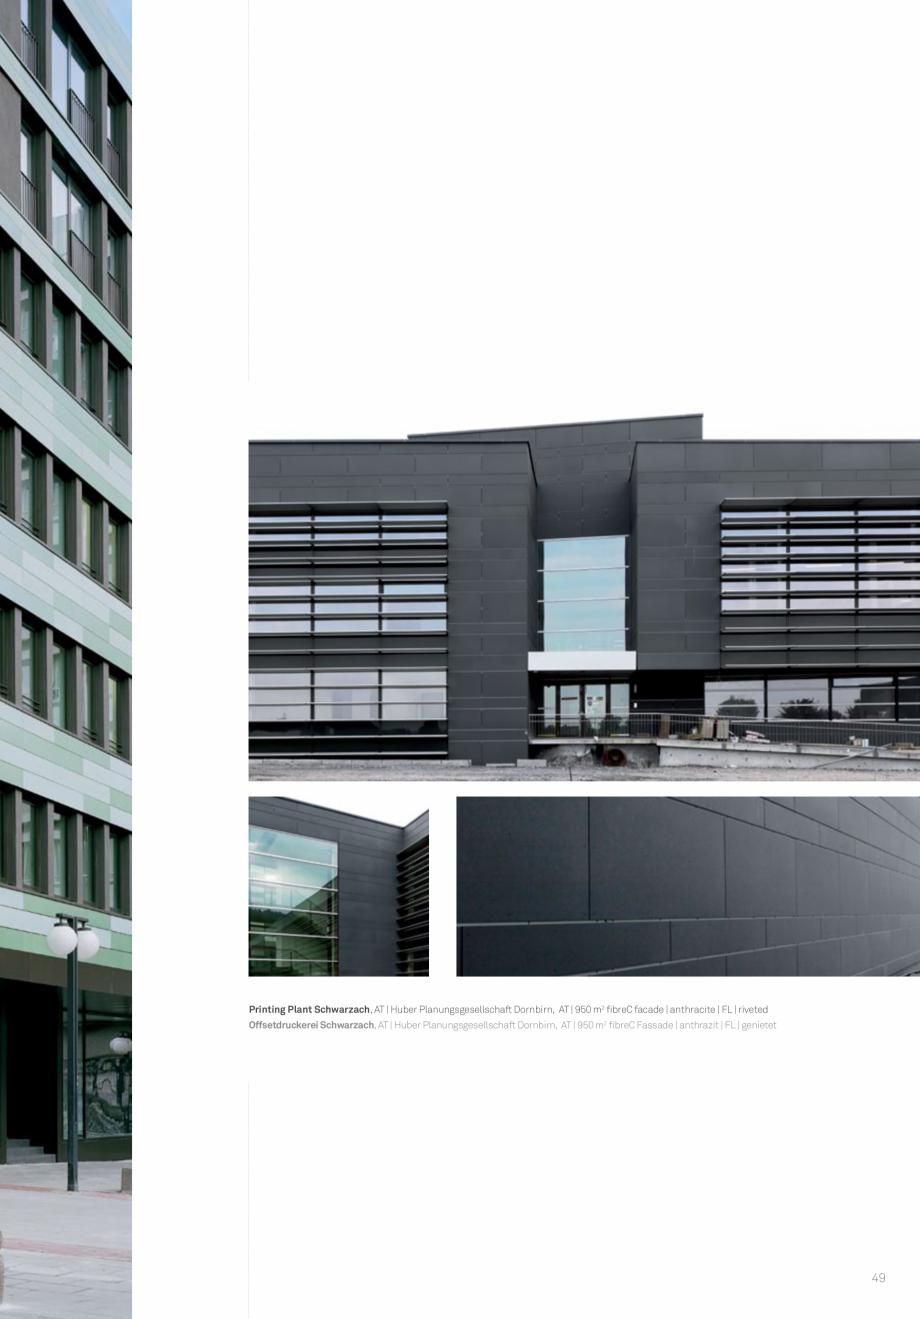 Pagina 51 - Panouri din beton aparent RIEDER Concrete Skin Lucrari, proiecte Engleza